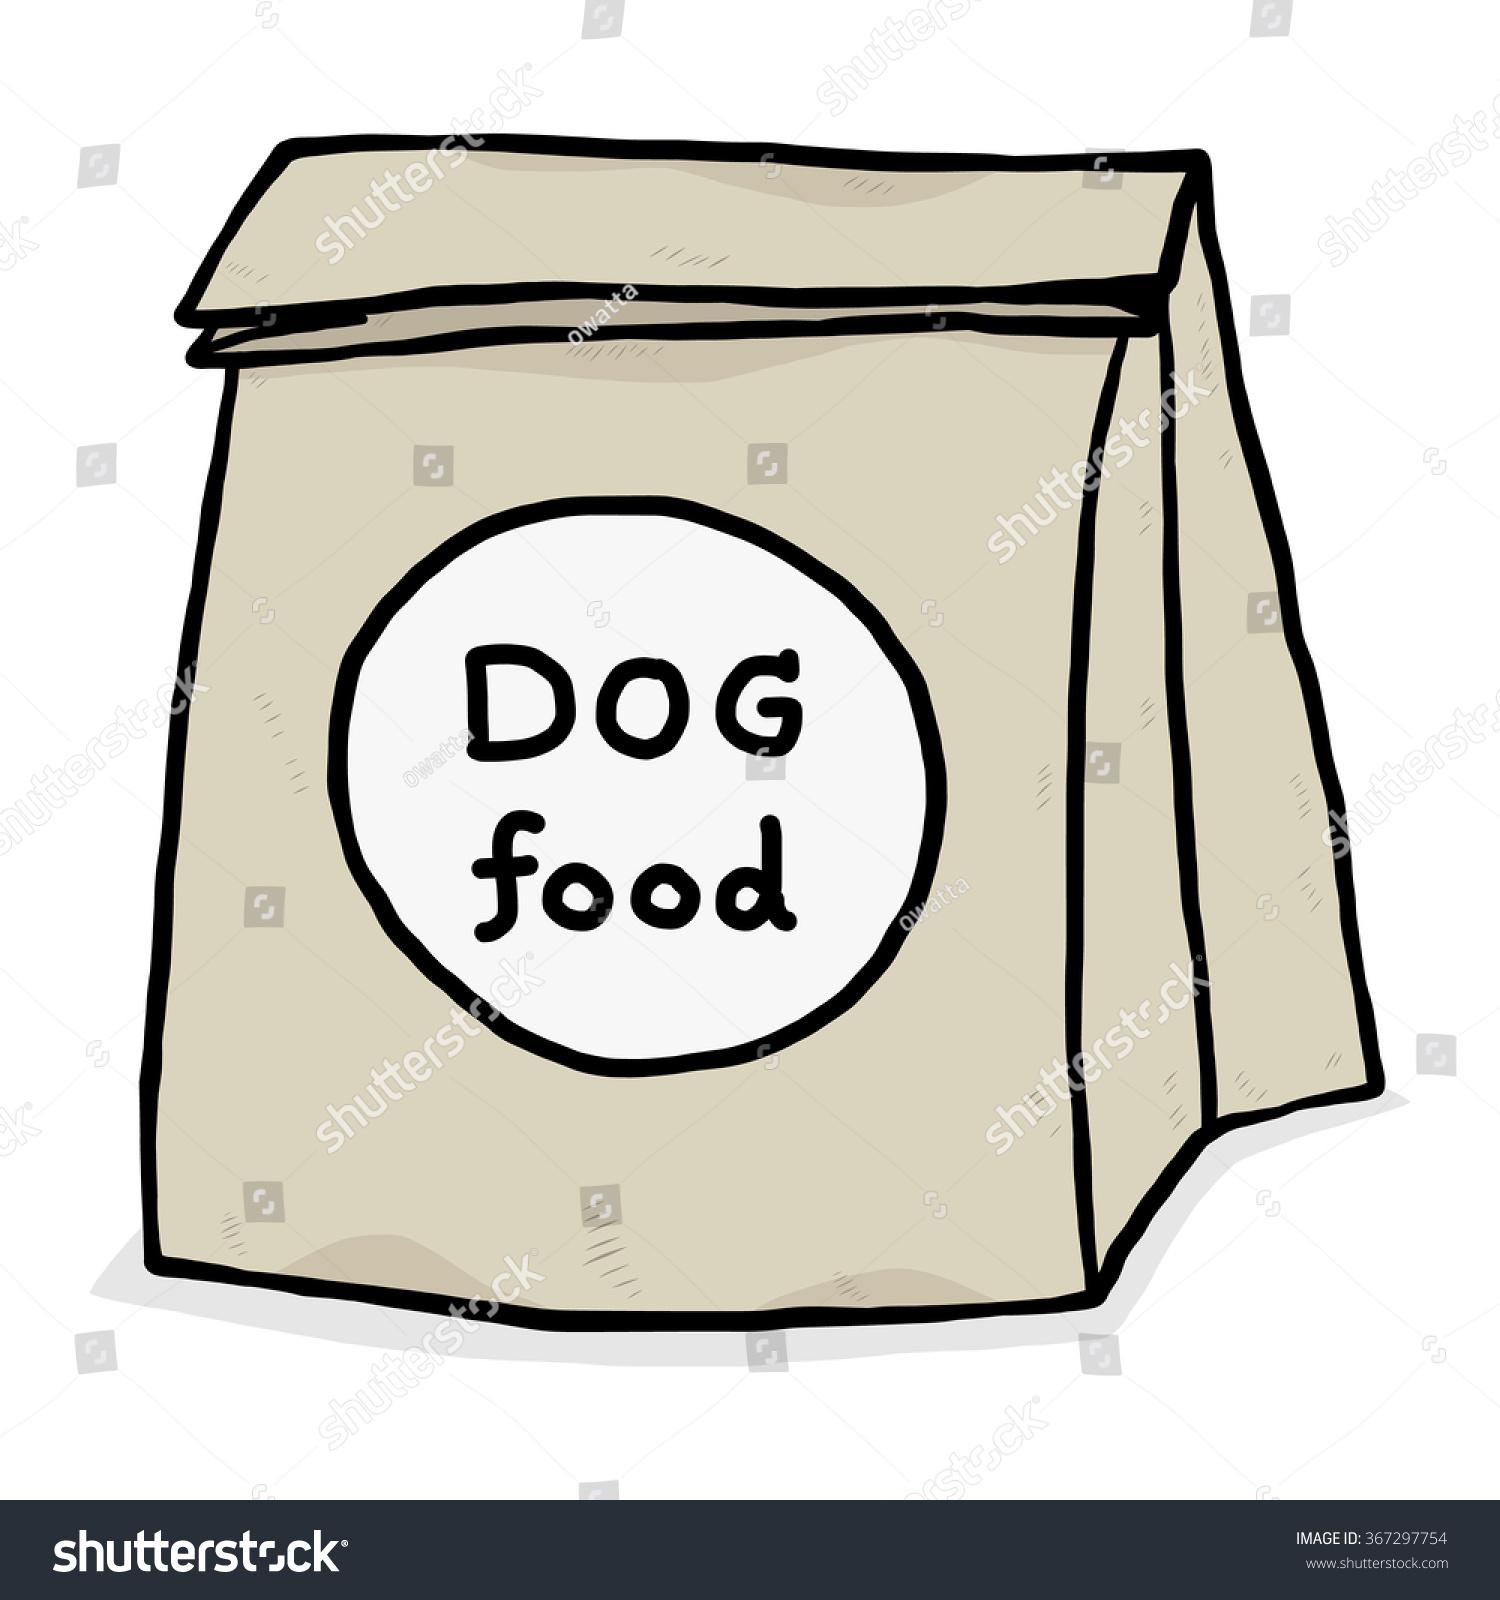 Dog Food Paper Bag Cartoon Vector Stock Vector 367297754 ...